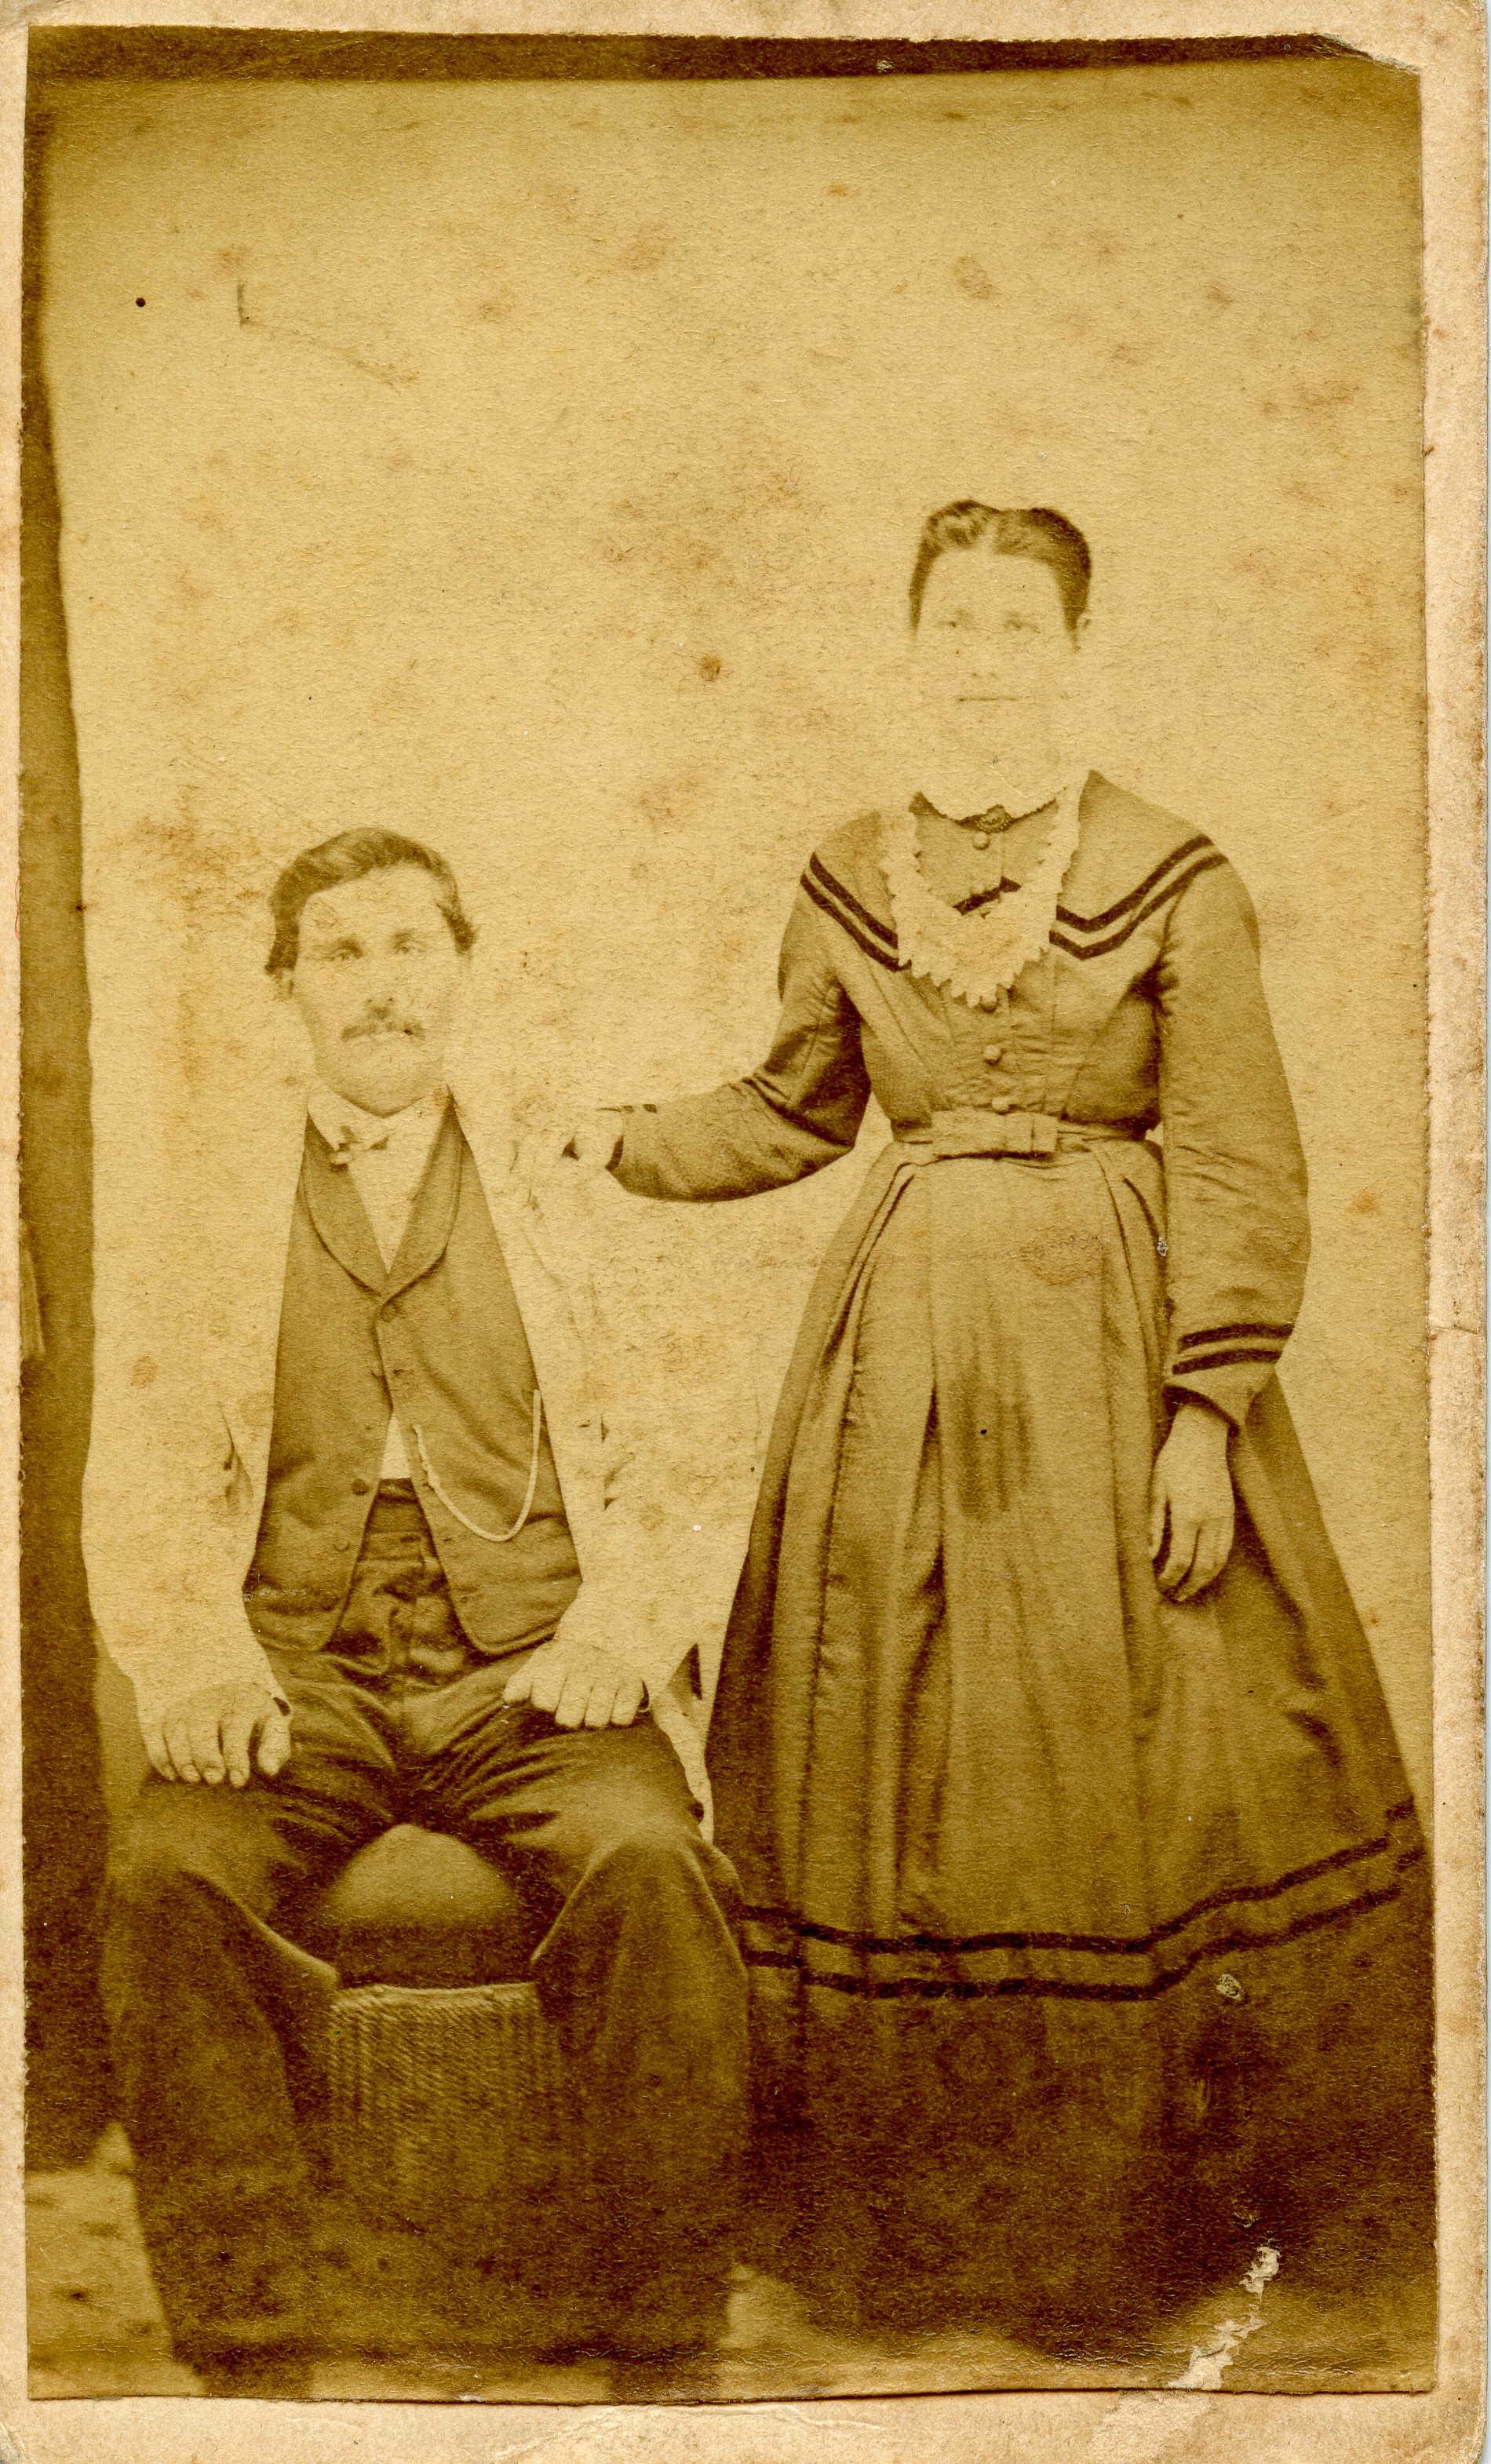 Joseph and Theresa Schwar